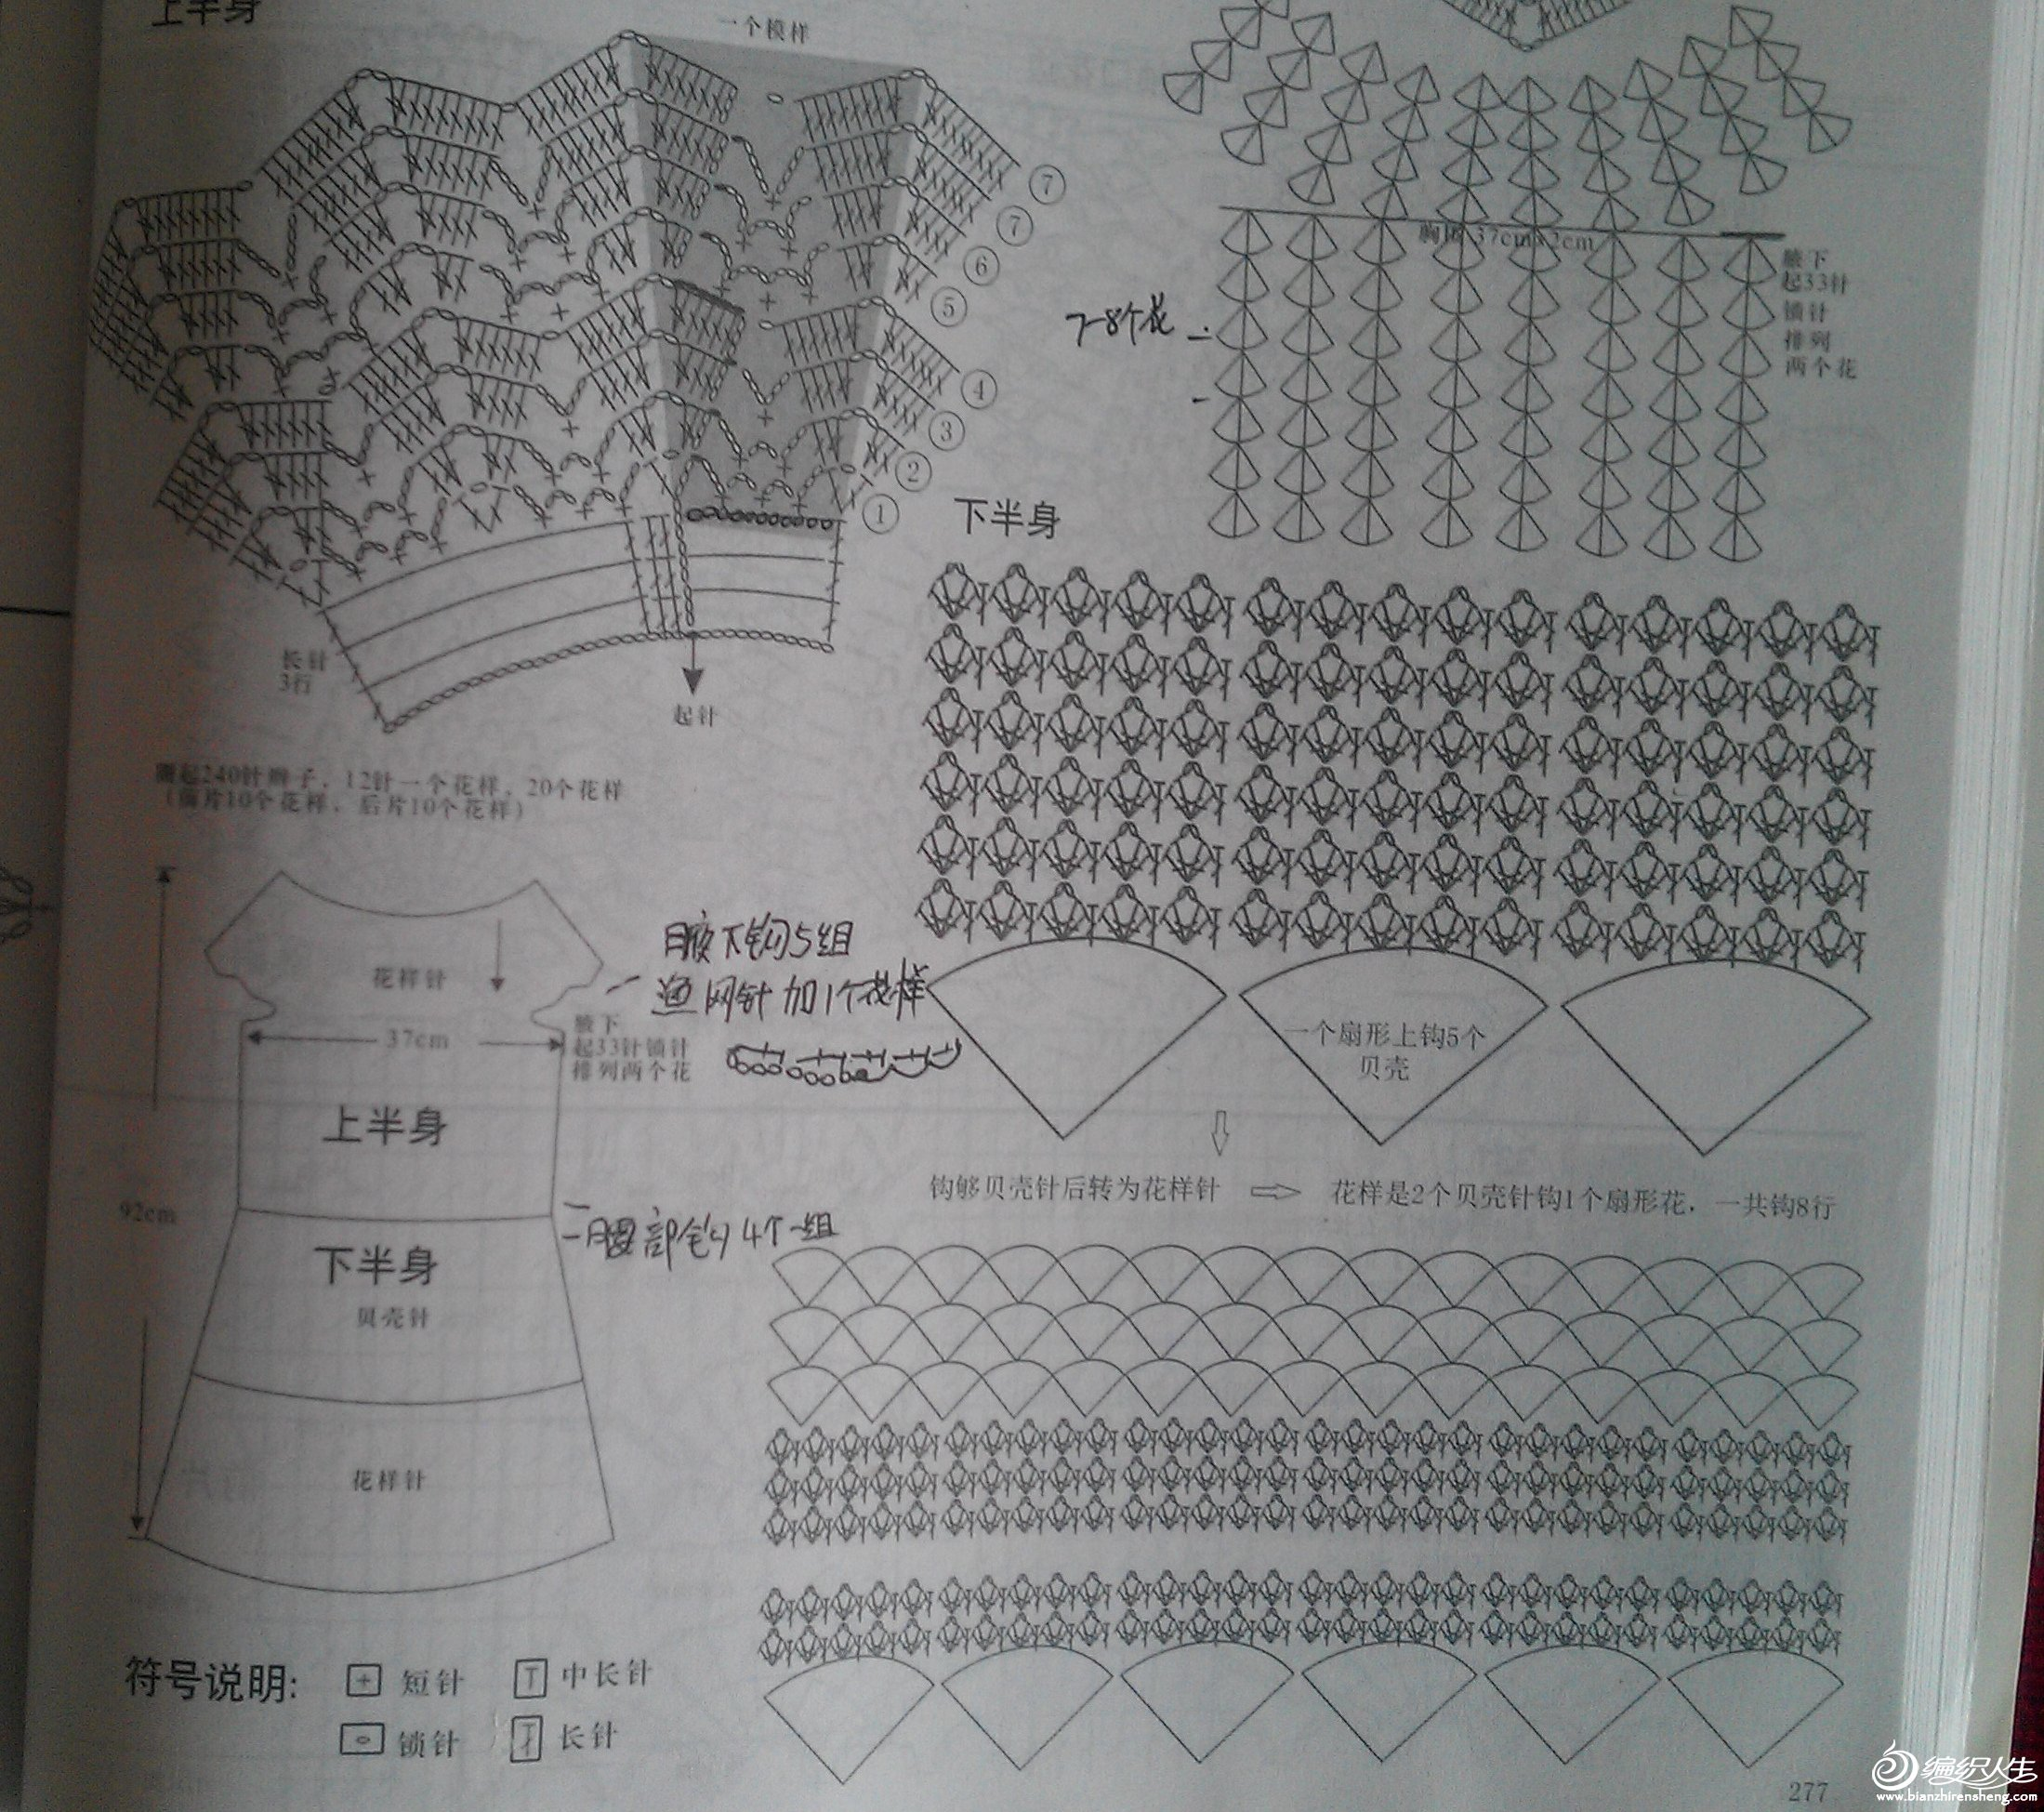 110526ivwz3aknz3mvnplv.jpg